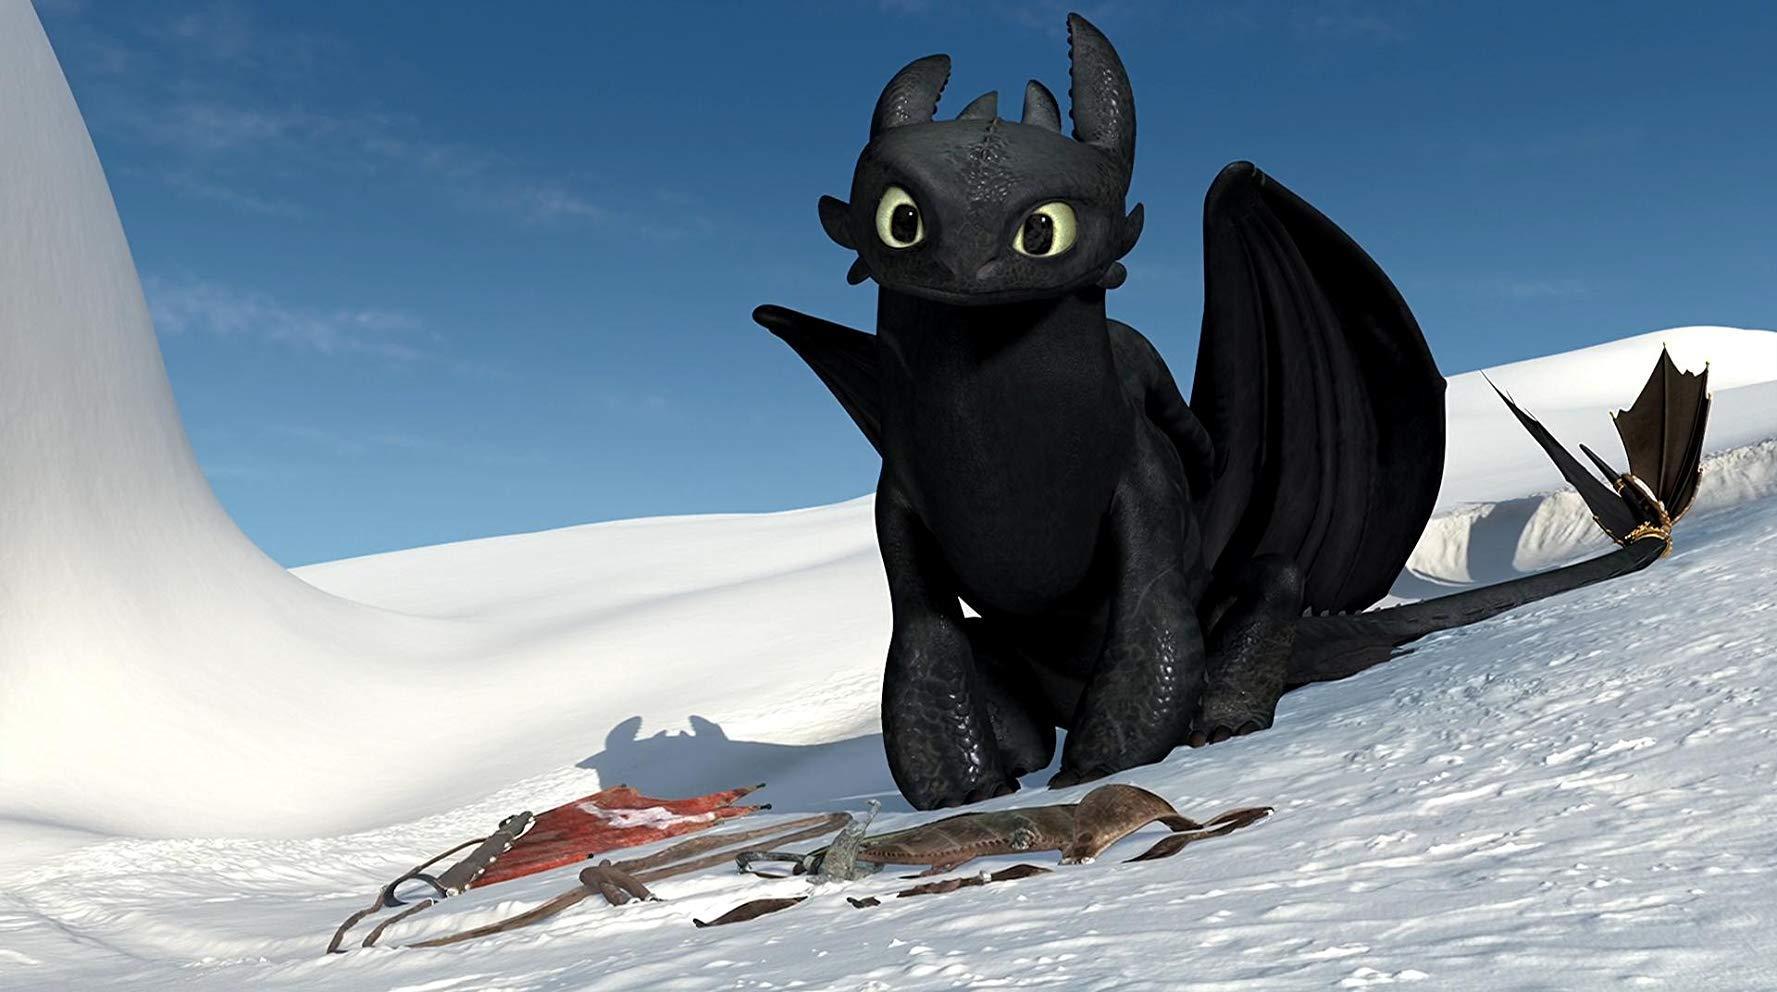 مشاهدة فيلم Dragons Gift Of The Night Fury 2011 HD مترجم كامل اون لاين